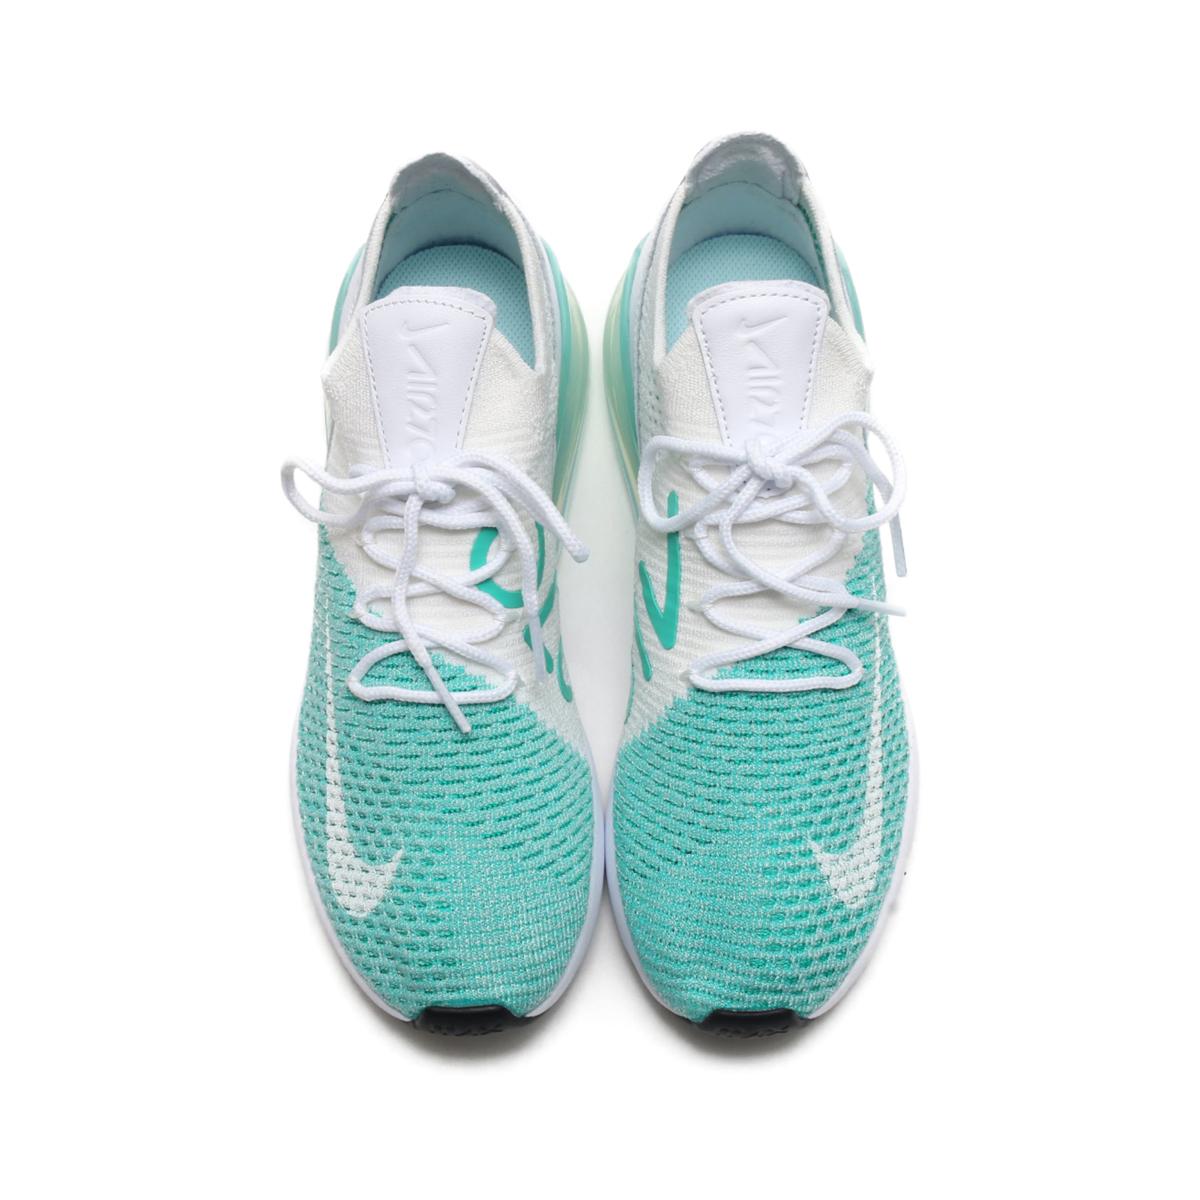 8bb04717adf53 NIKE W AIR MAX 270 FLYKNIT (Nike women Air Max 270 fried food knit) (IGLOO  WHITE-IGLOO-CLEAR EMERALD) 18SU-S